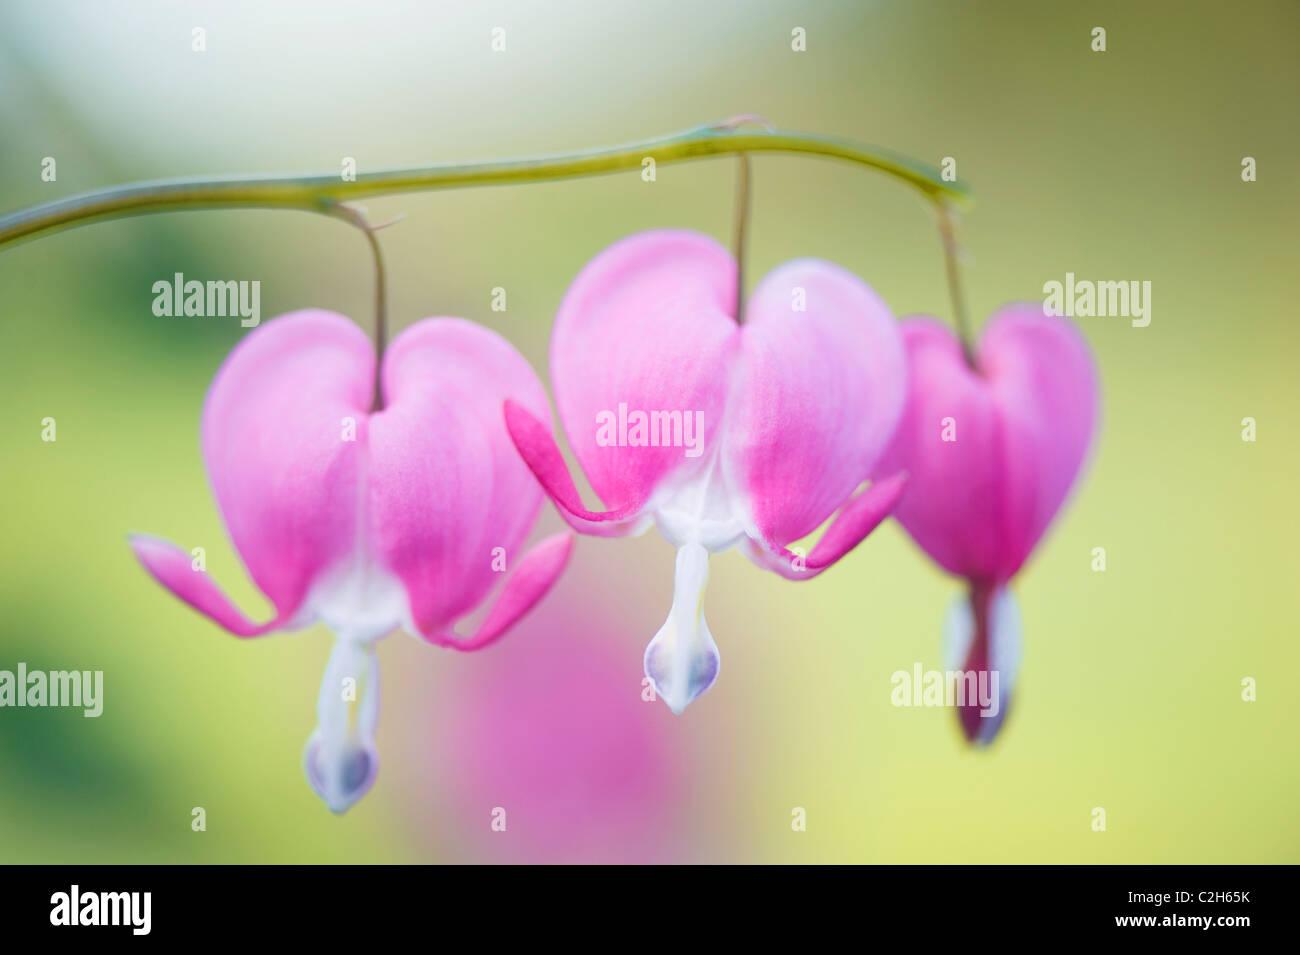 Dicentra Spectabilis -  Bleeding Heart, Loves Lies Bleeding - Stock Image